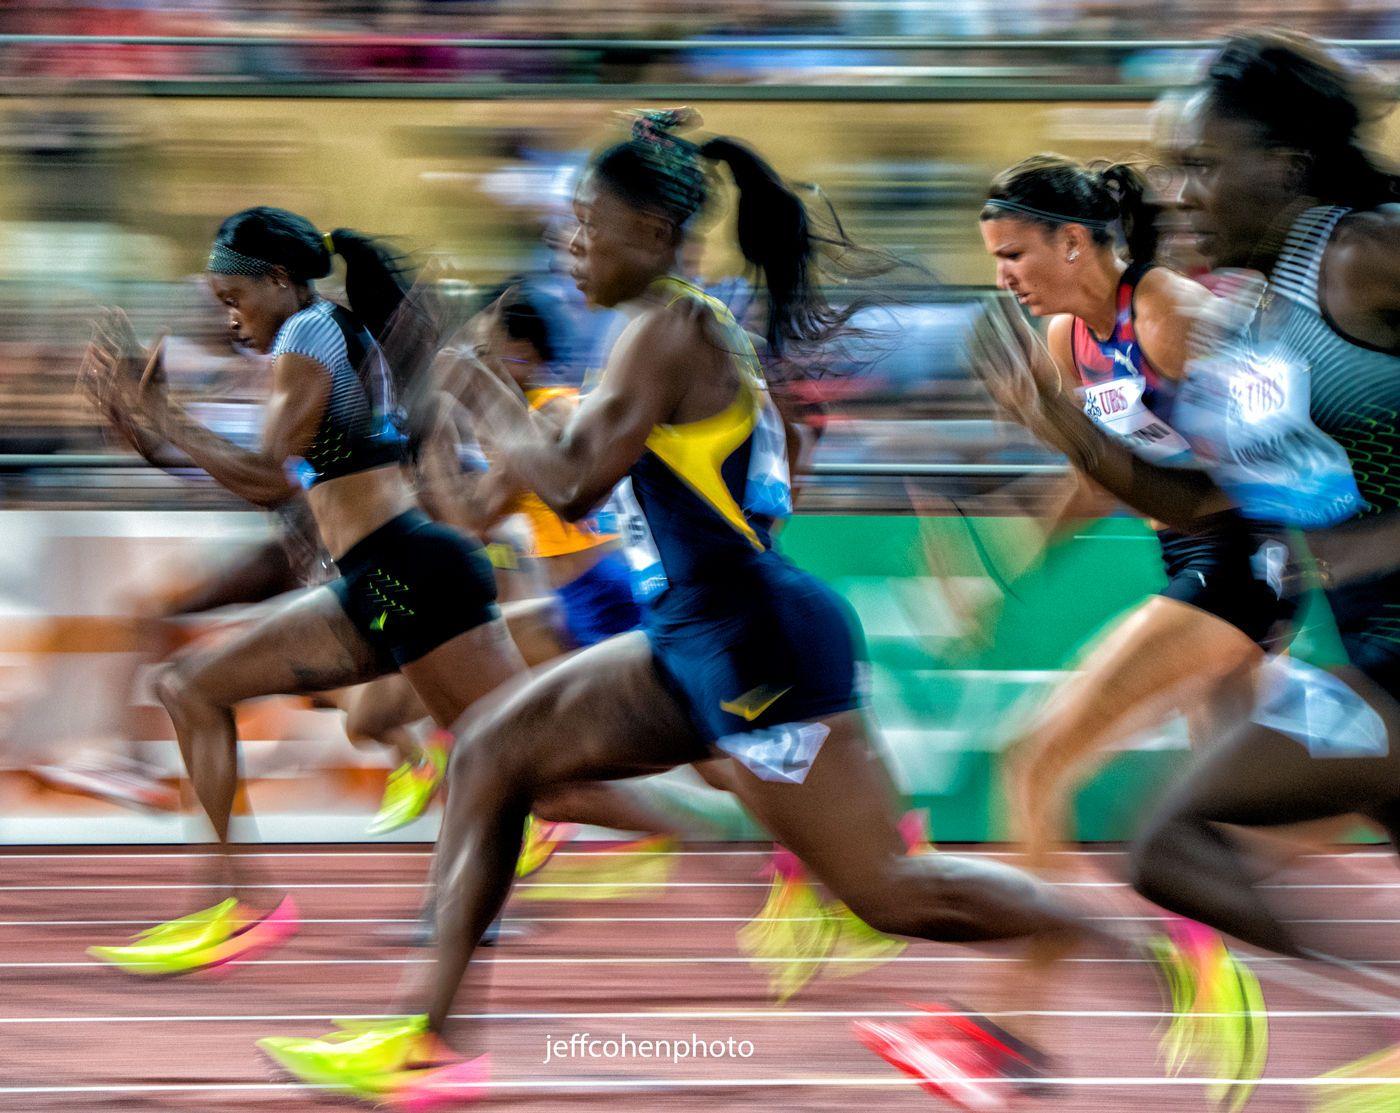 1r2016_athletissima_lausanne_e_thompson_100mw_jeff_cohen_photo_1836_web.jpg